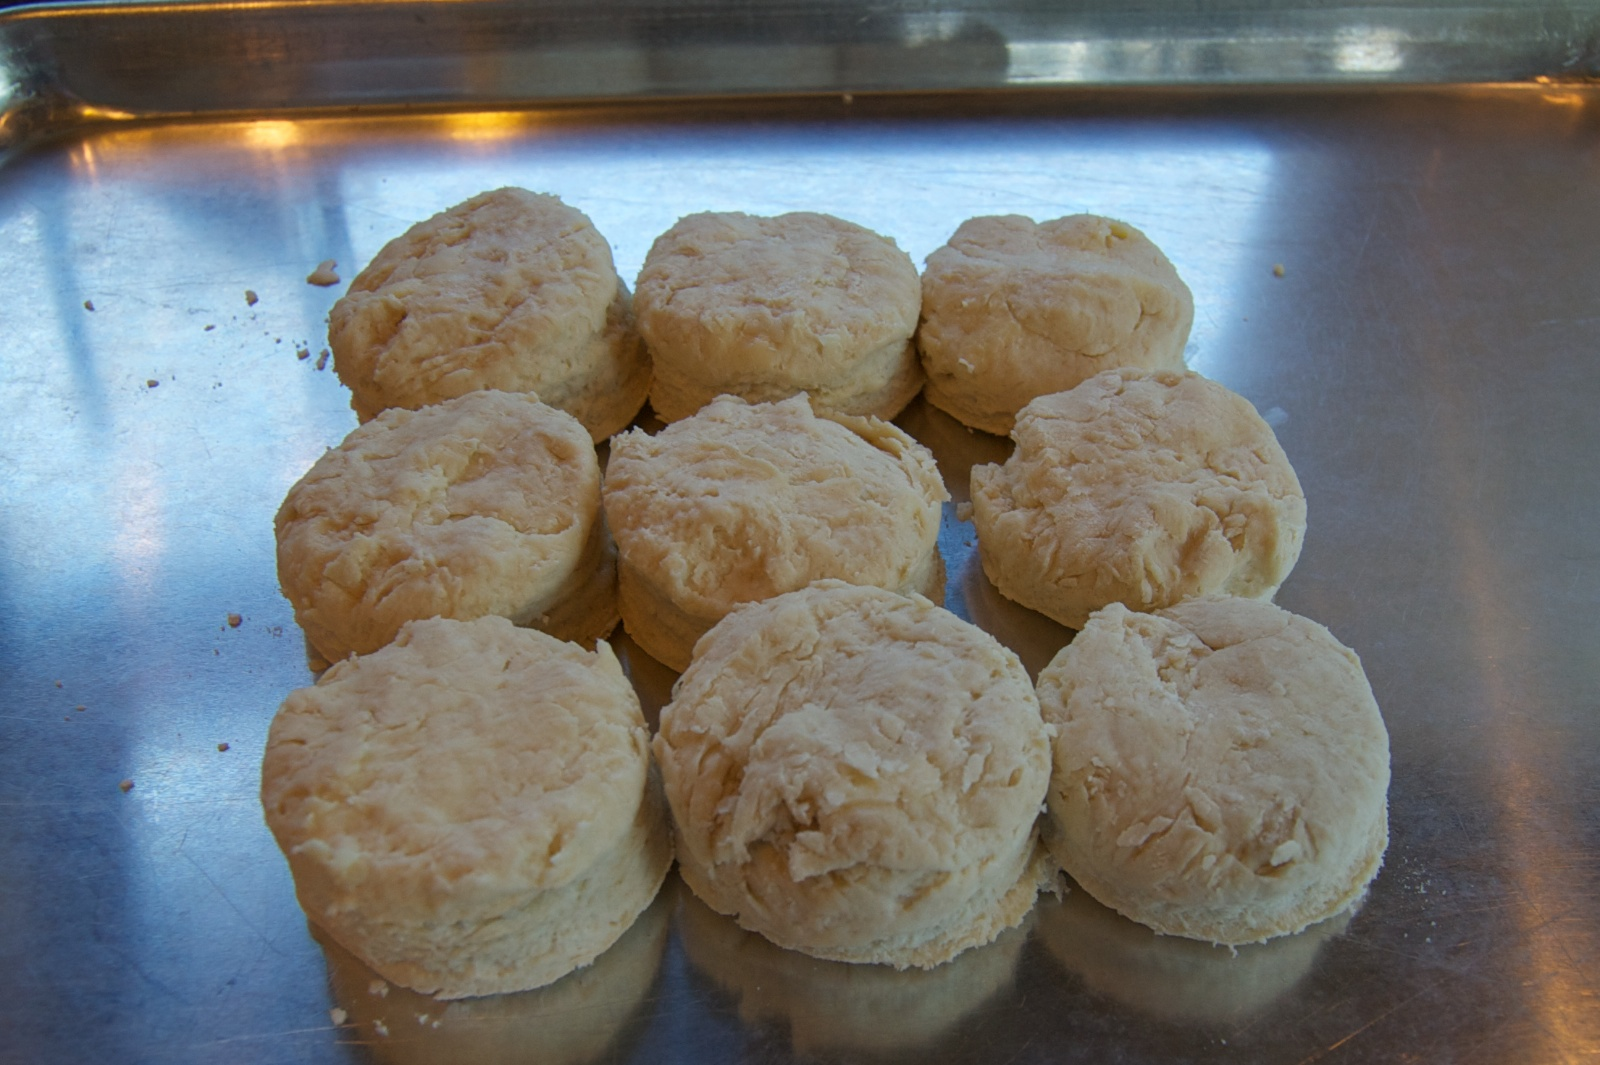 http://blog.rickk.com/food/2012/08/25/ate.2012.08.24.c6.jpg